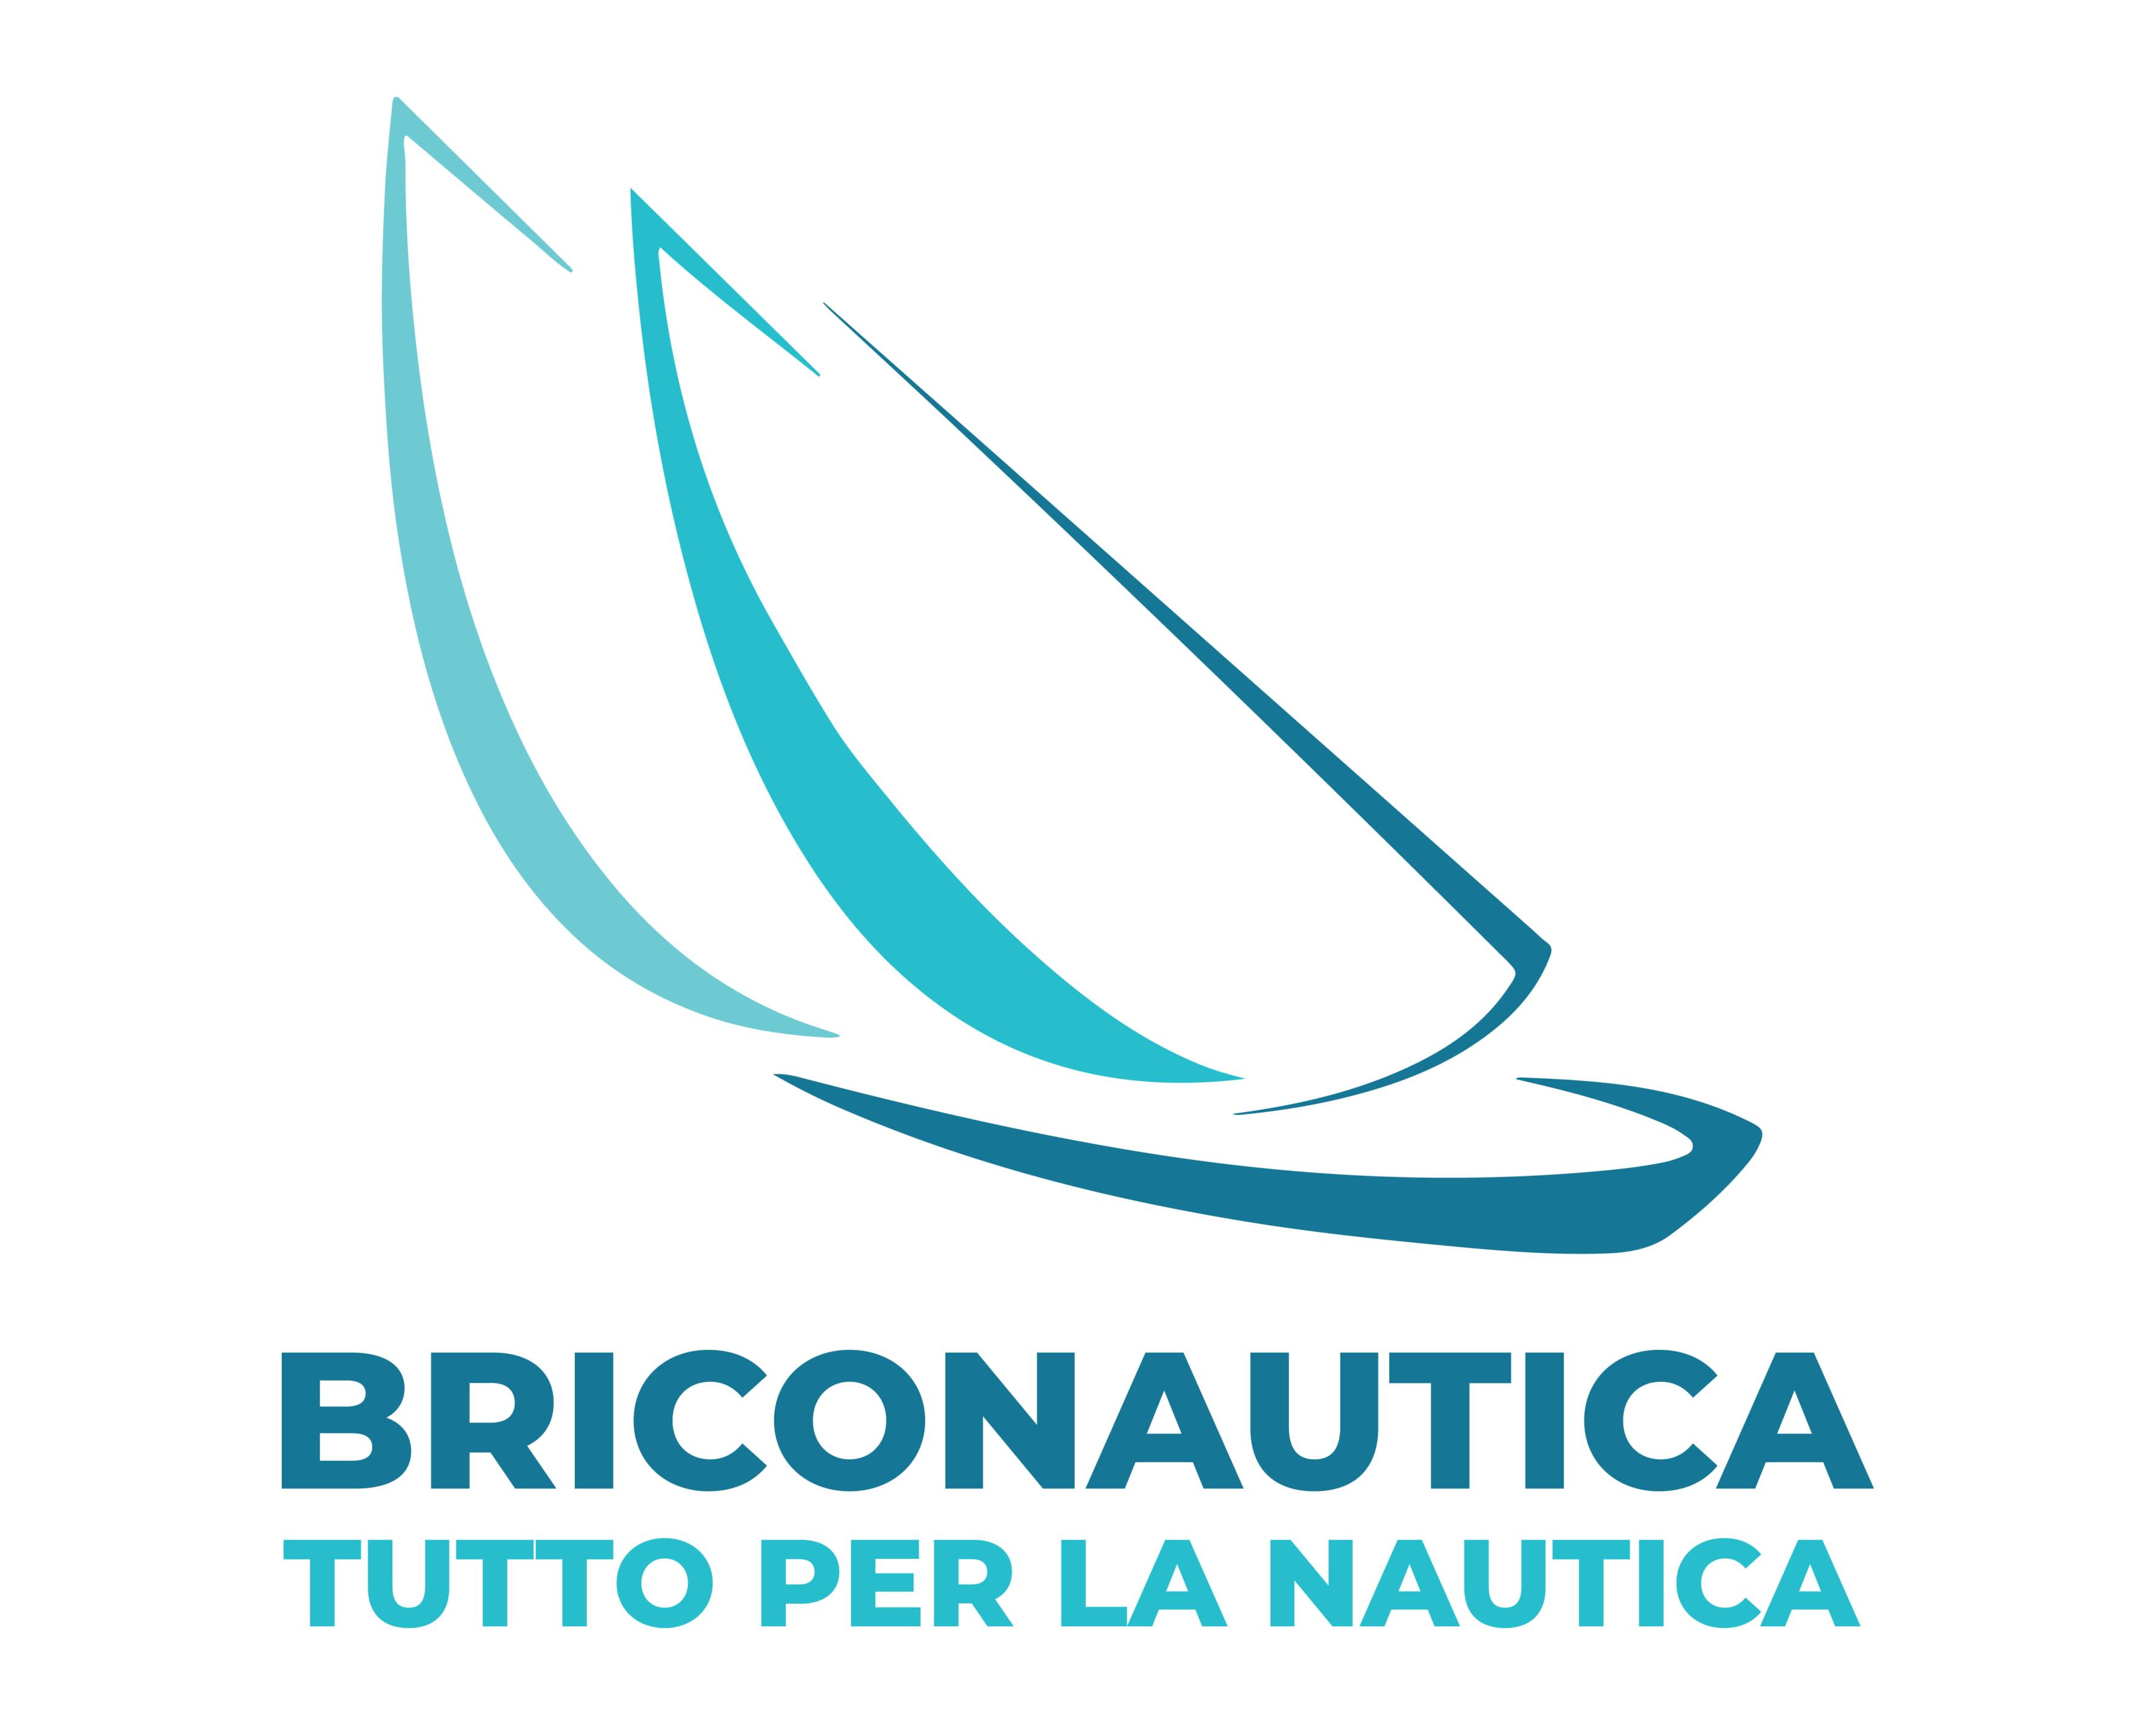 BRICONAUTICA SEDE OPERATIVA